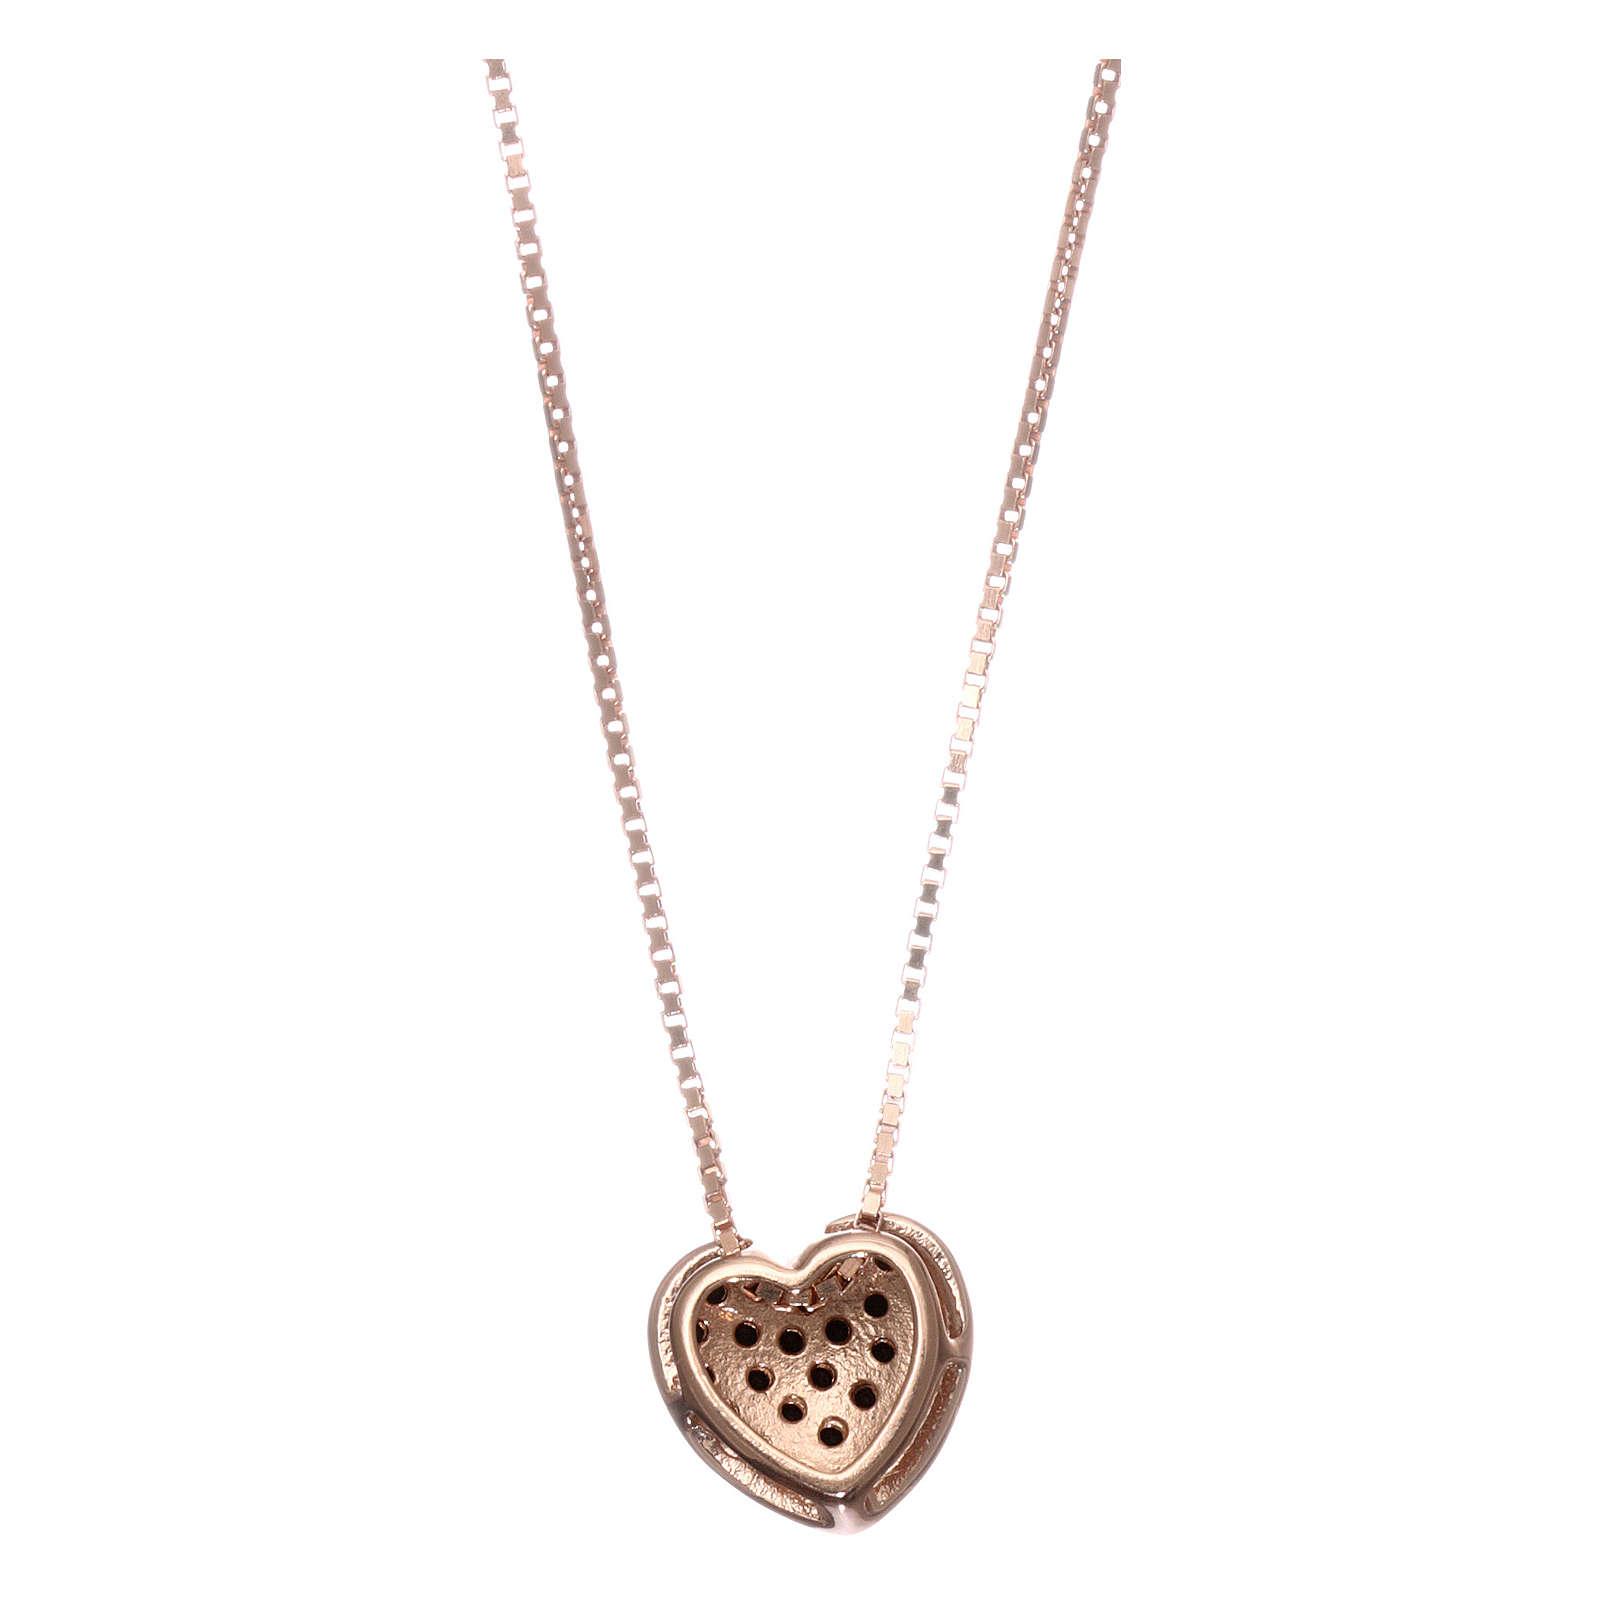 Collana AMEN argento 925 rosé cuore zirconi neri  4